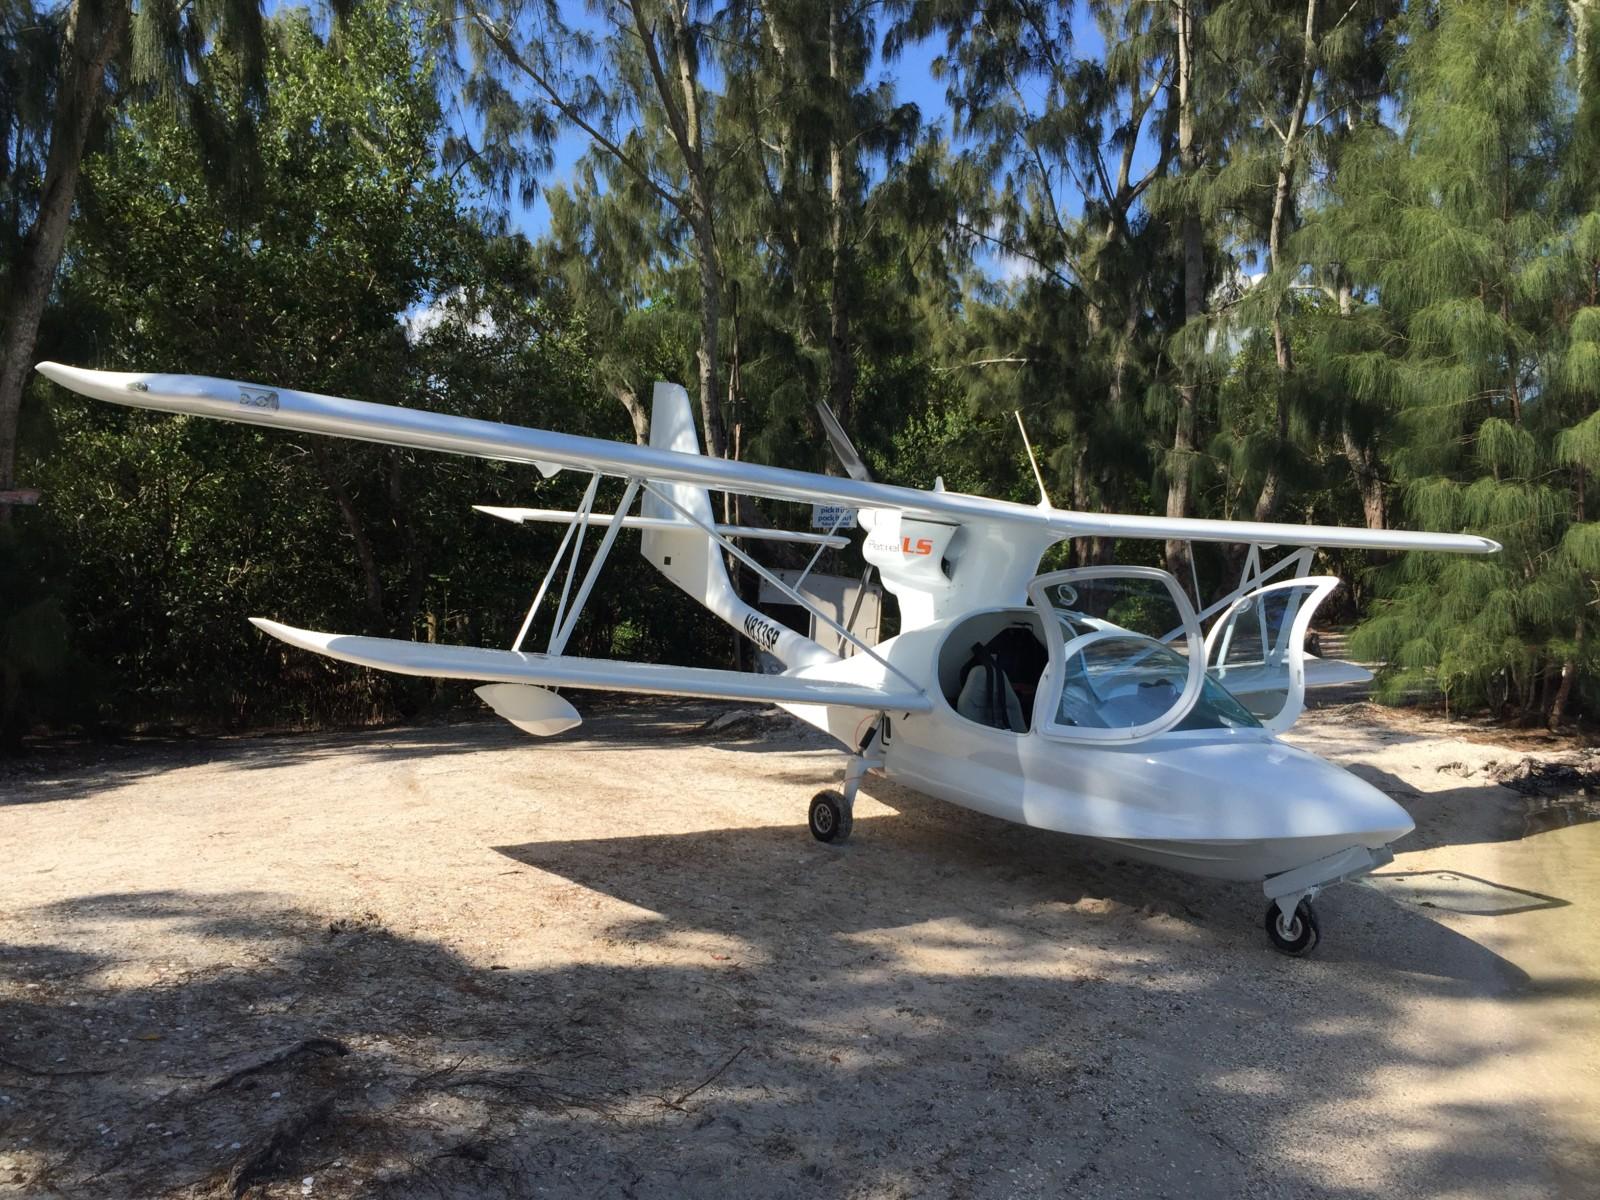 E B E D B Ce Dbc D A A on Aircraft Repair Manual